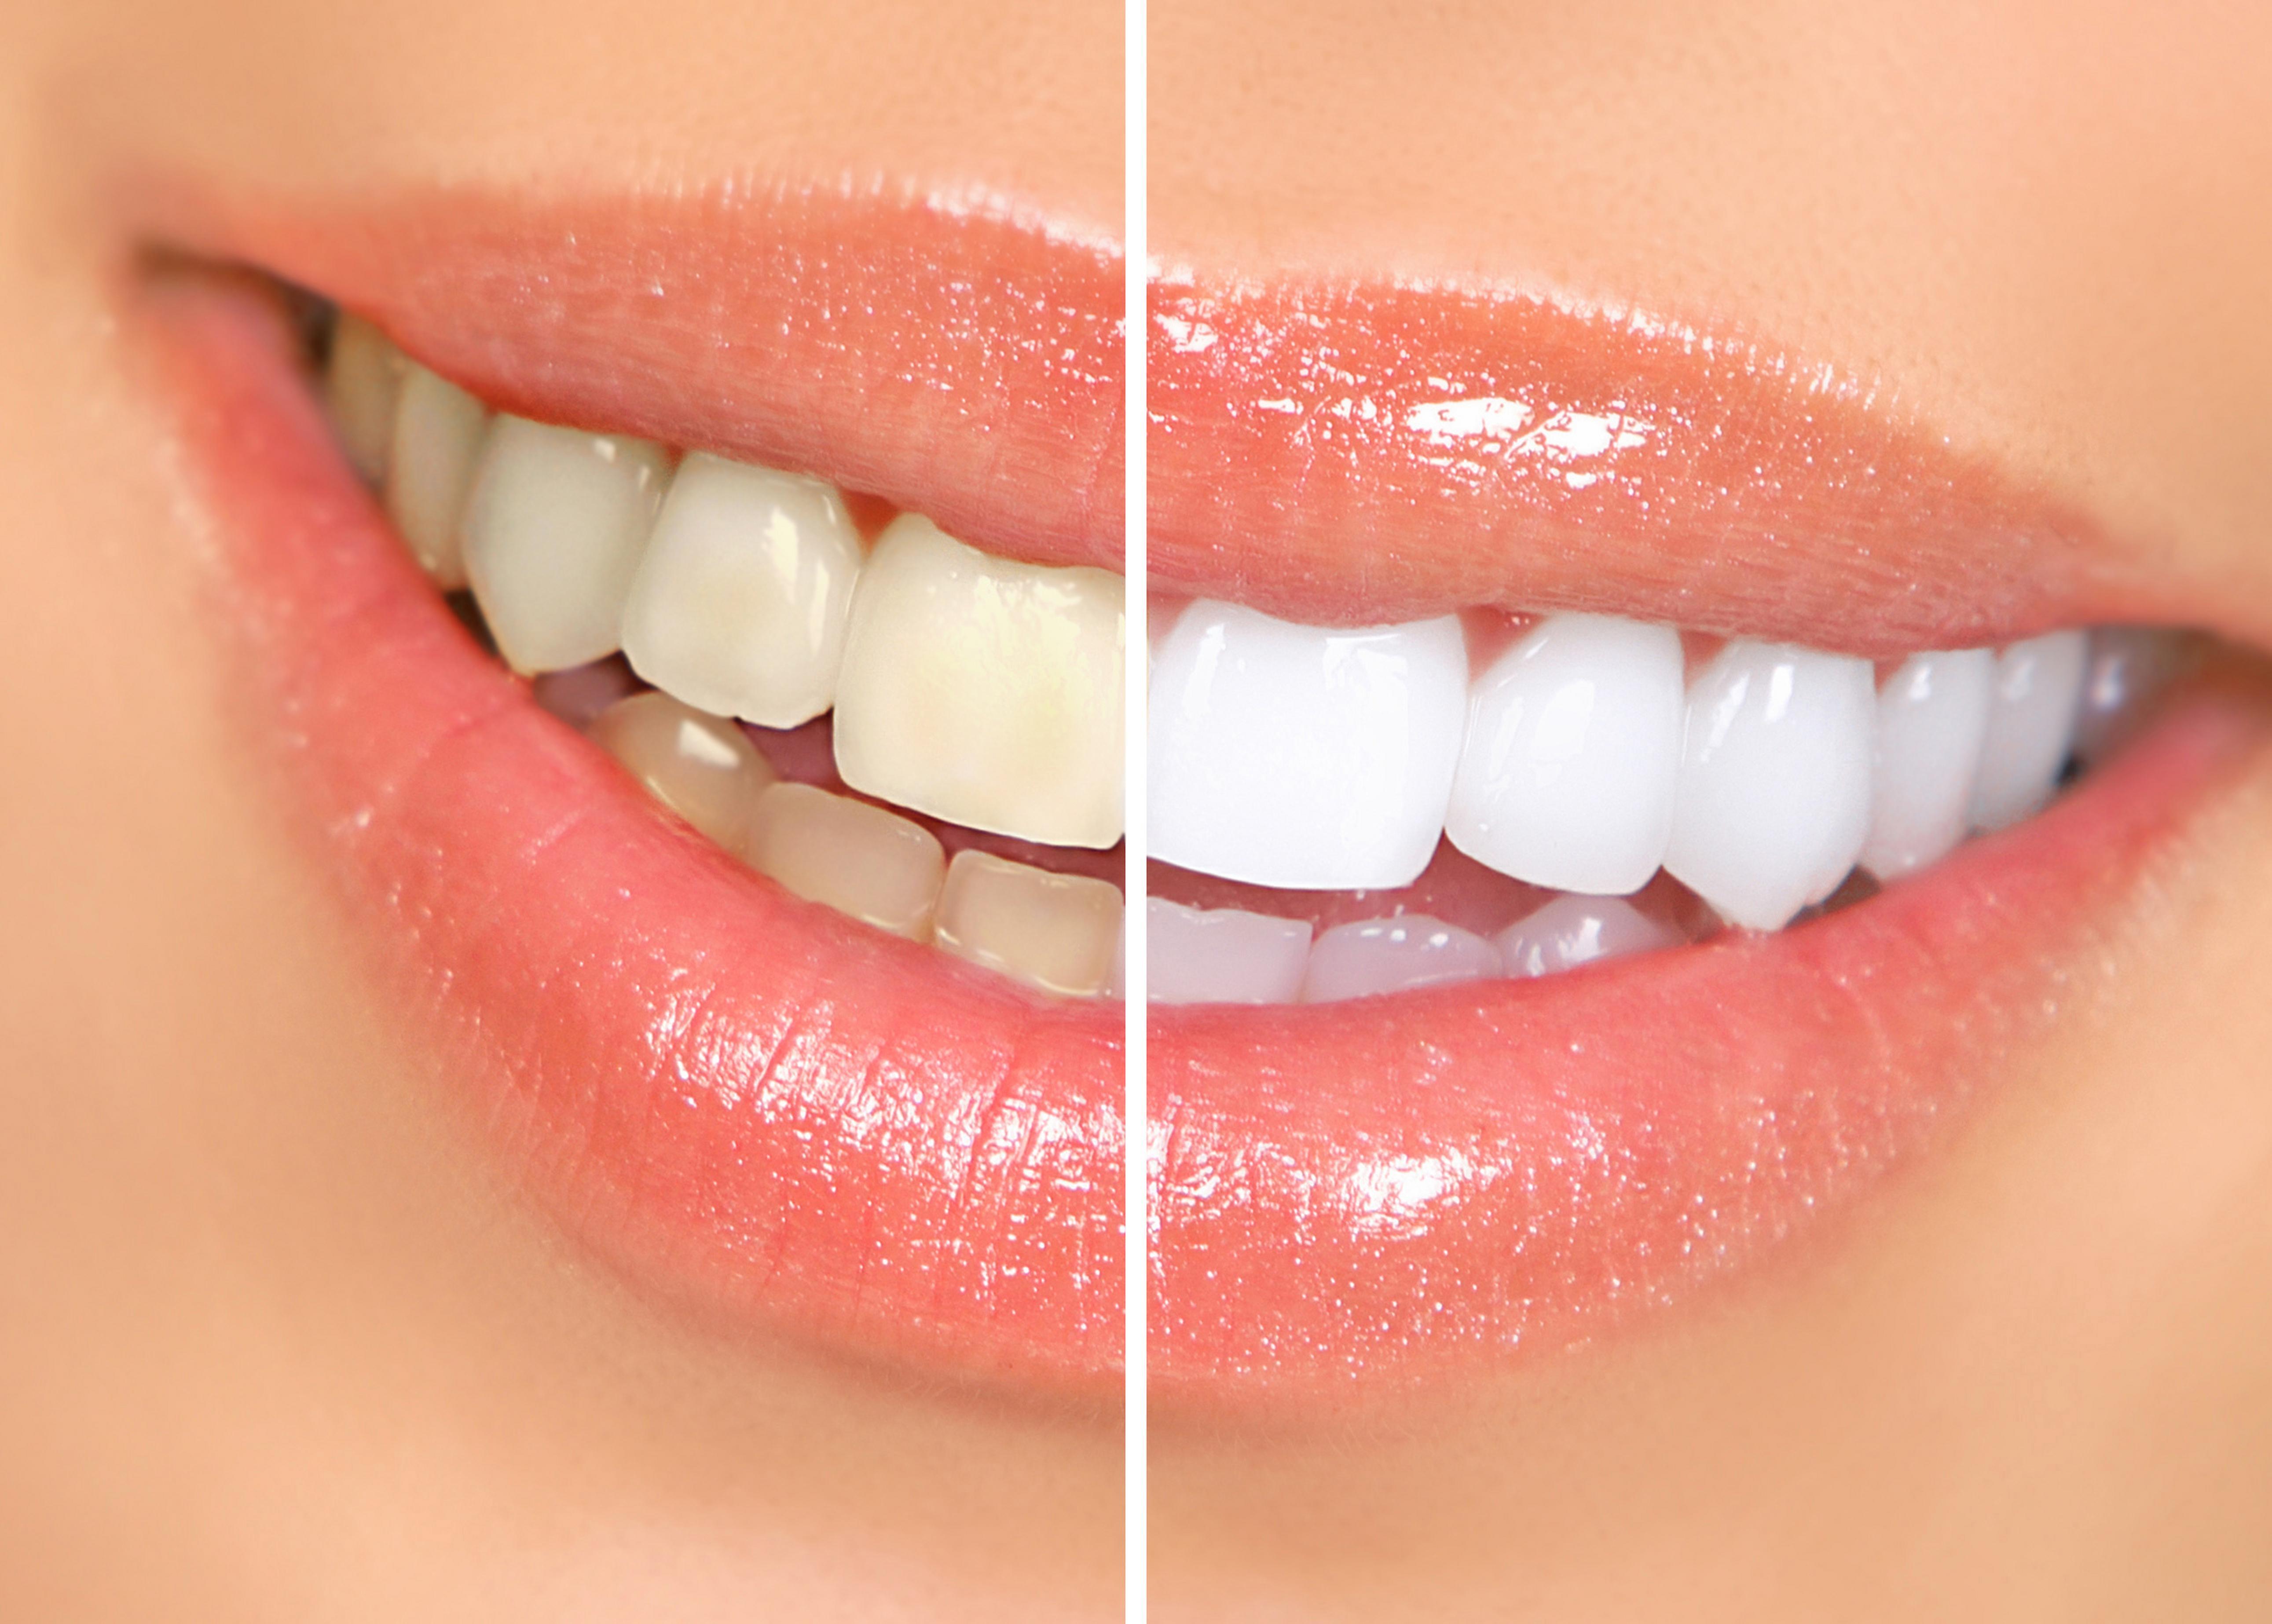 Clareamento Dental – Técnicas de Clareamento Dental